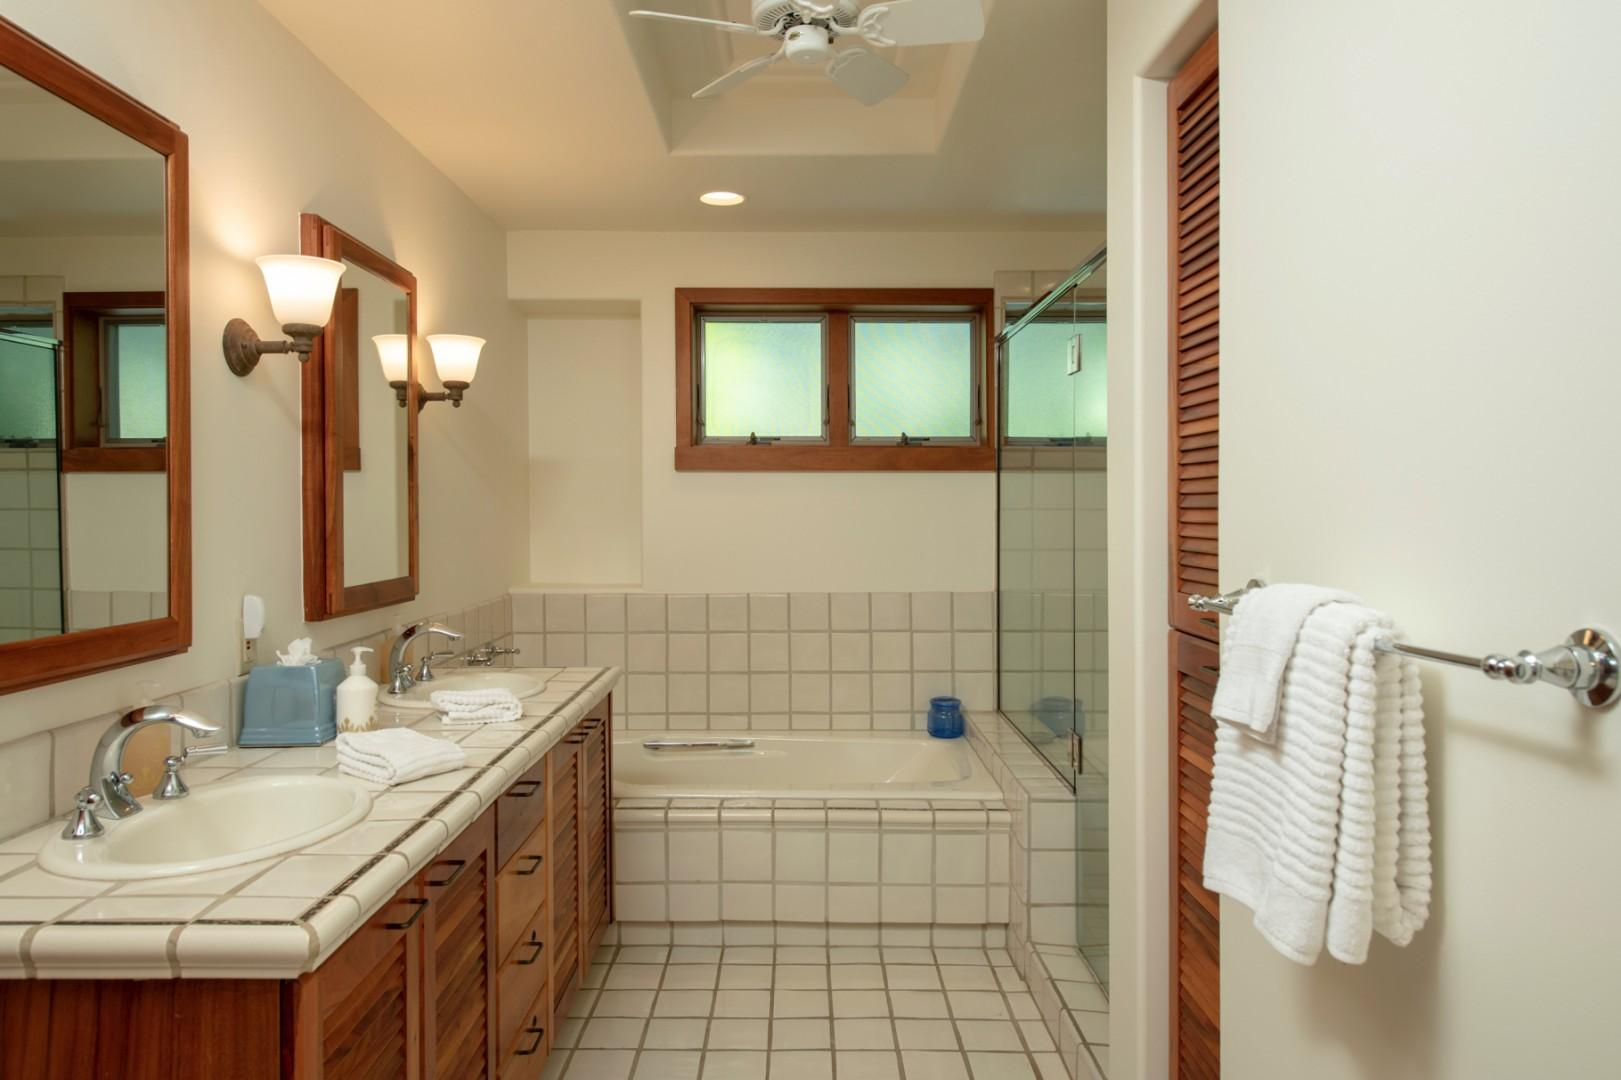 Second bathroom w/dual vanity, soaking tub & walk-in shower.